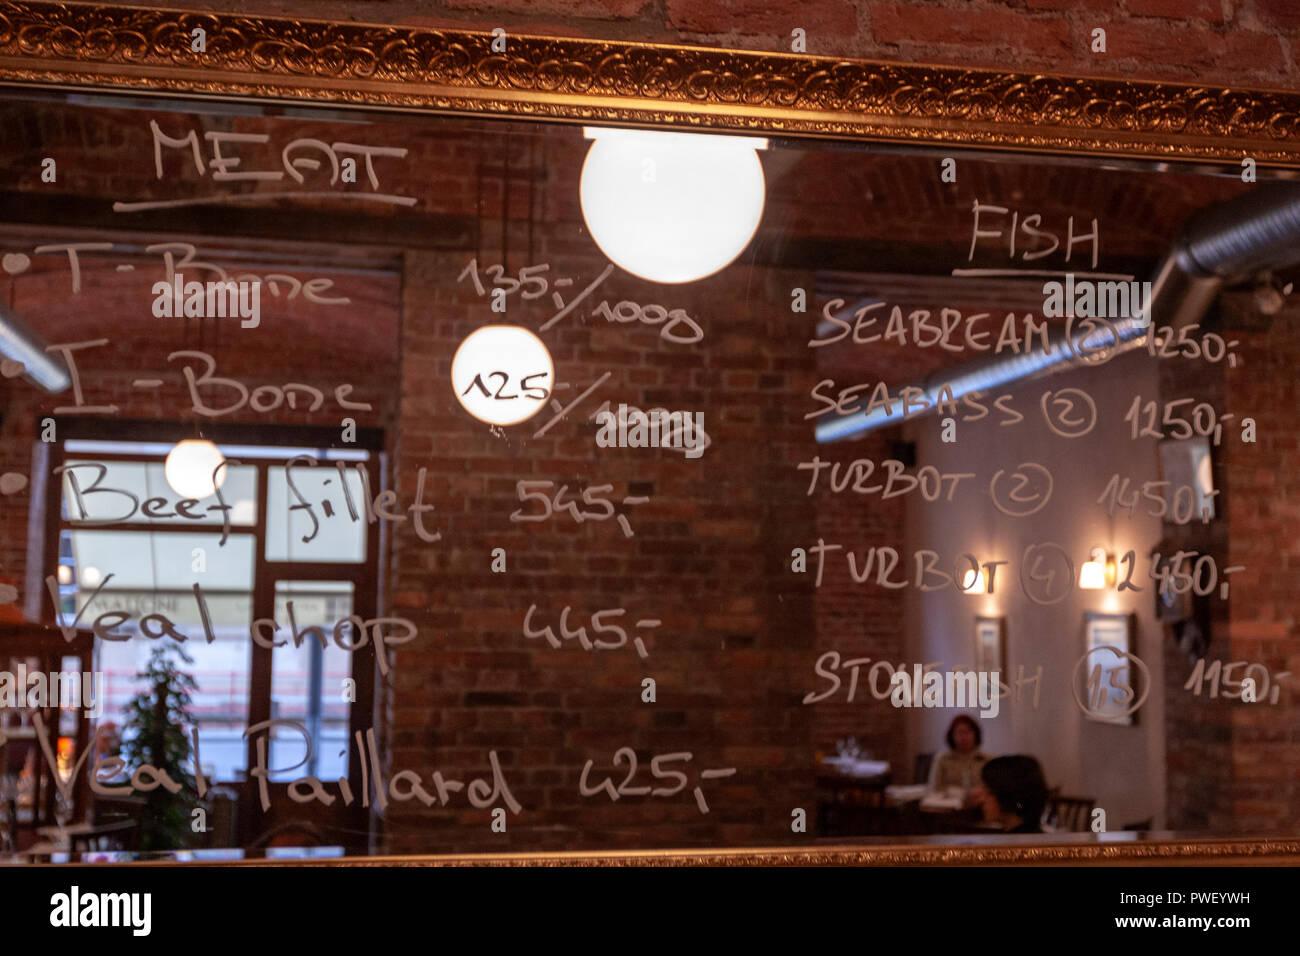 Today's menu written in a mirror in a restaurant in Prague, Czech Republic. - Stock Image